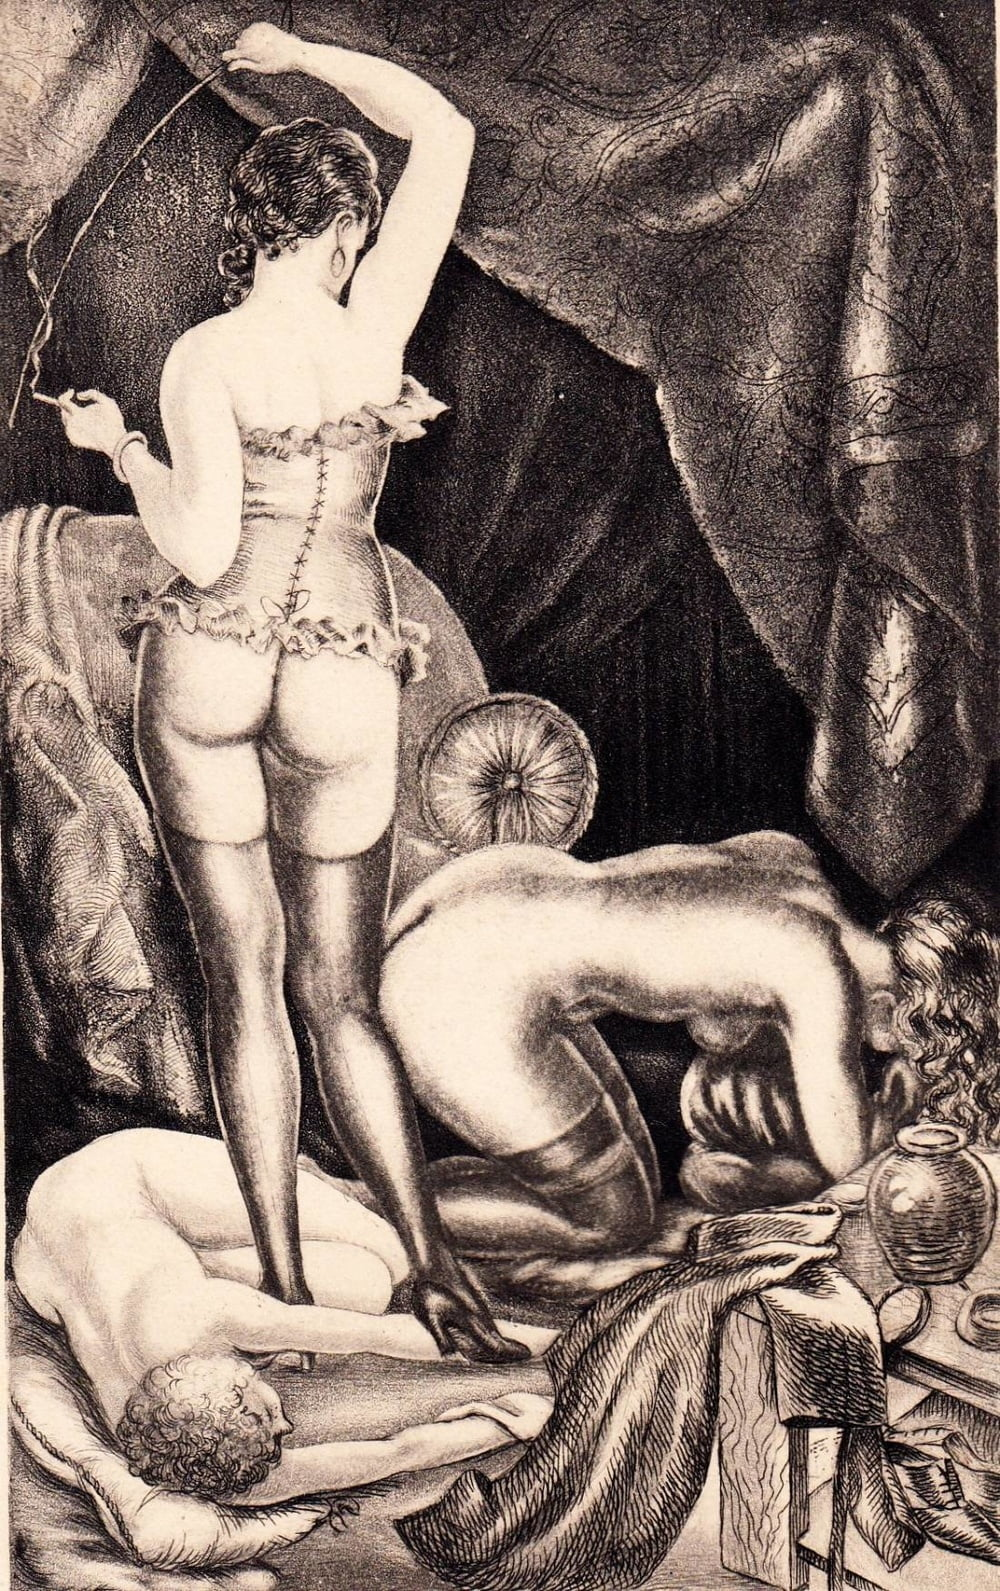 staraya-erotika-risunki-u-parnya-stoyak-porno